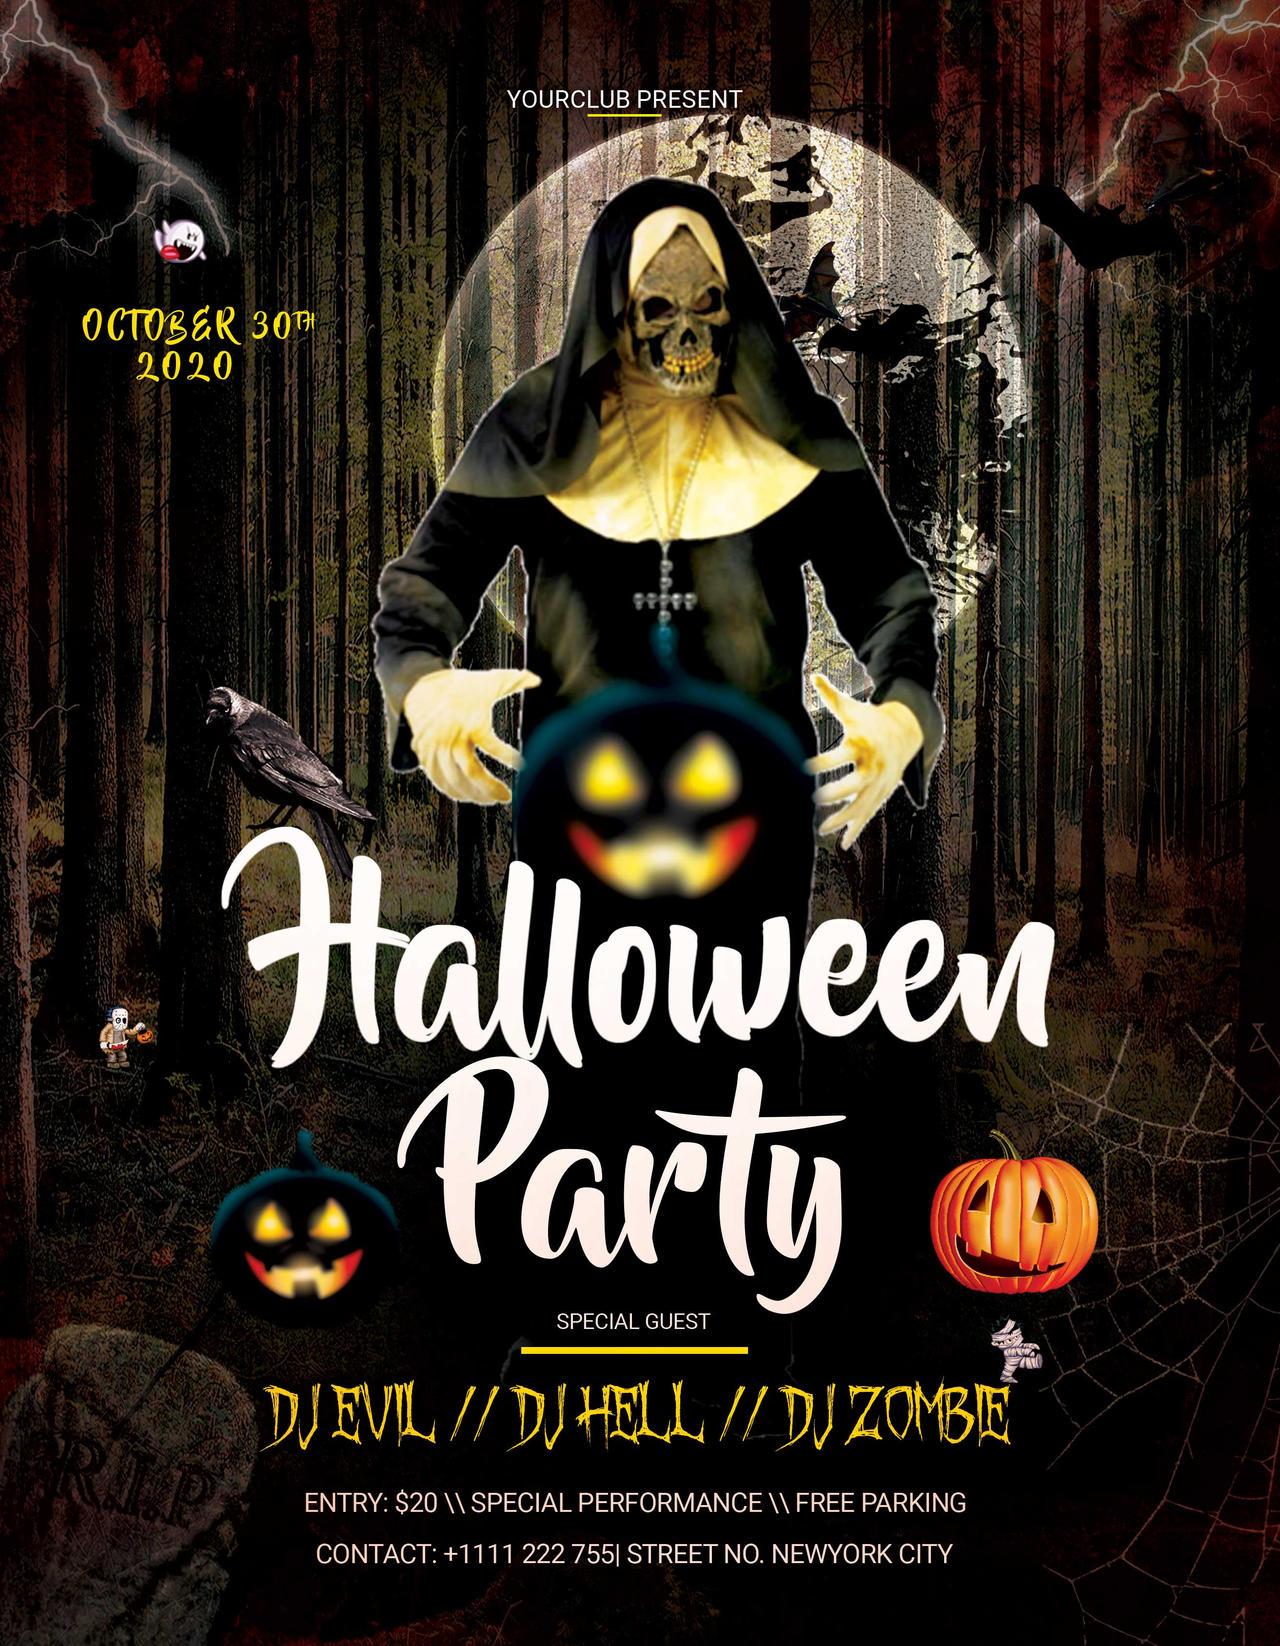 Halloween Party Flyer 2020 Halloween Party PSD Flyer Free Templates by StudioFlyers on DeviantArt